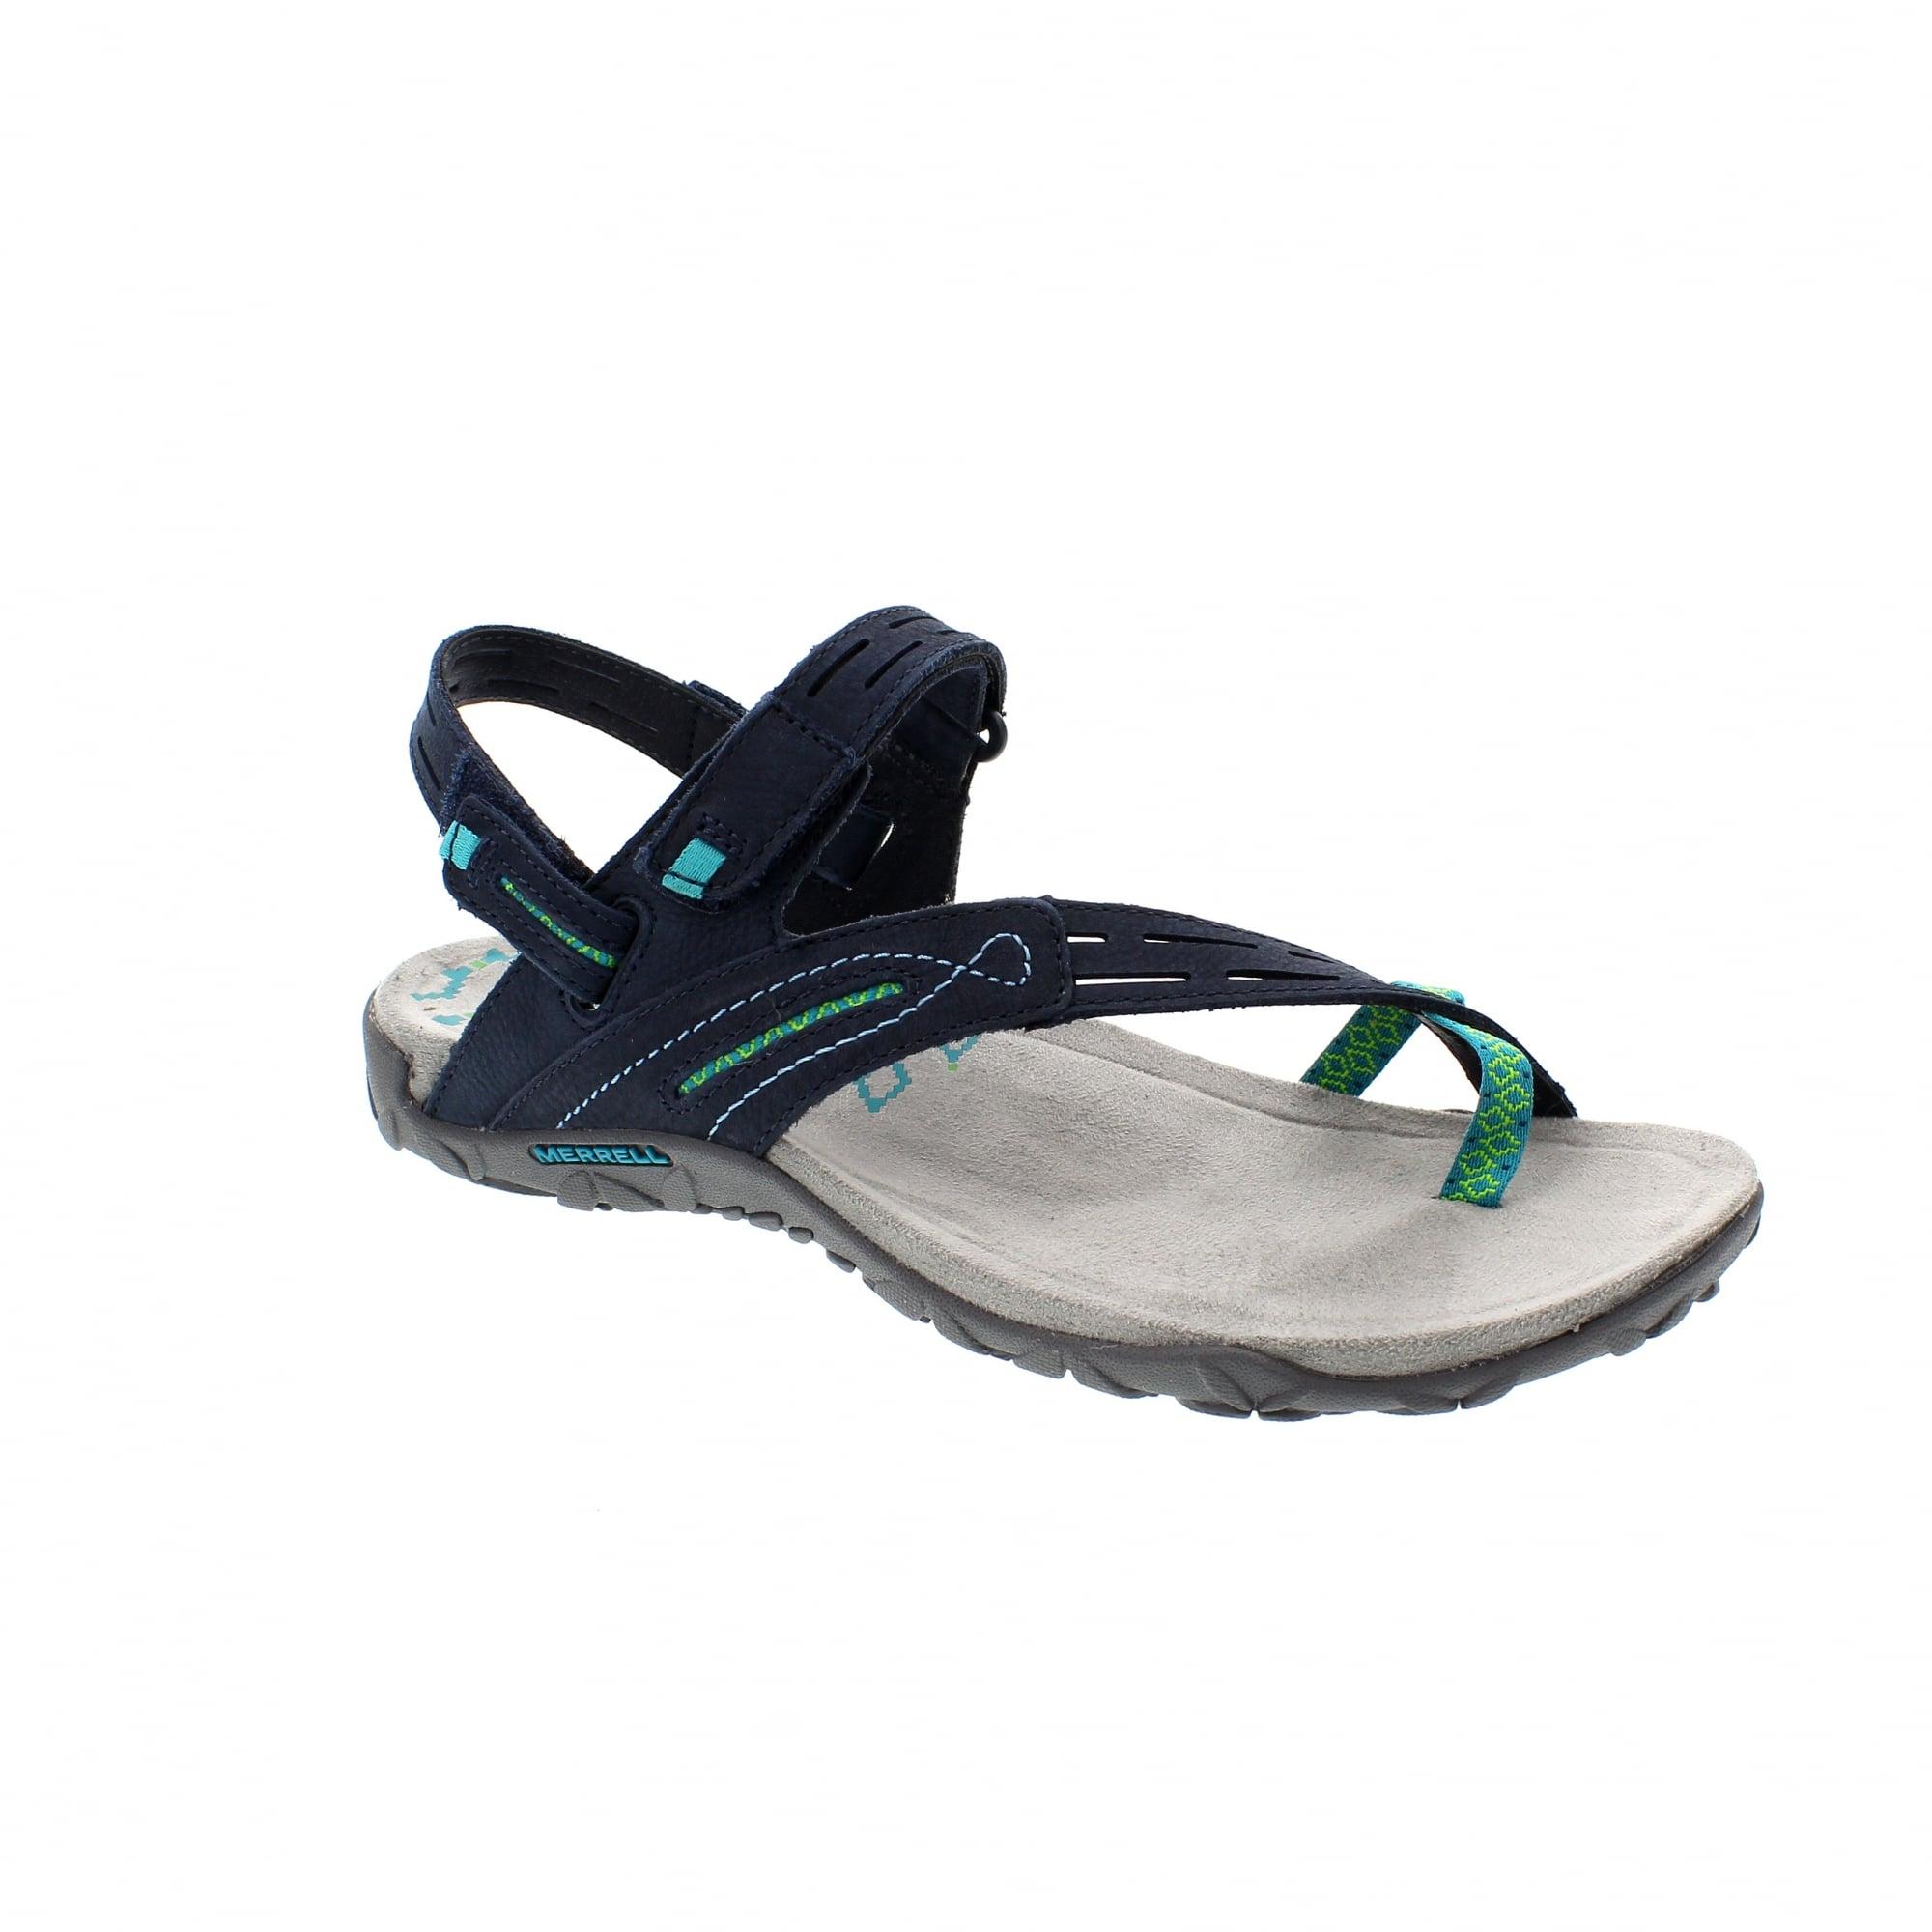 d9d91fd4b67f Merrell Terran Convert II J54818 Womens Walking Sandals